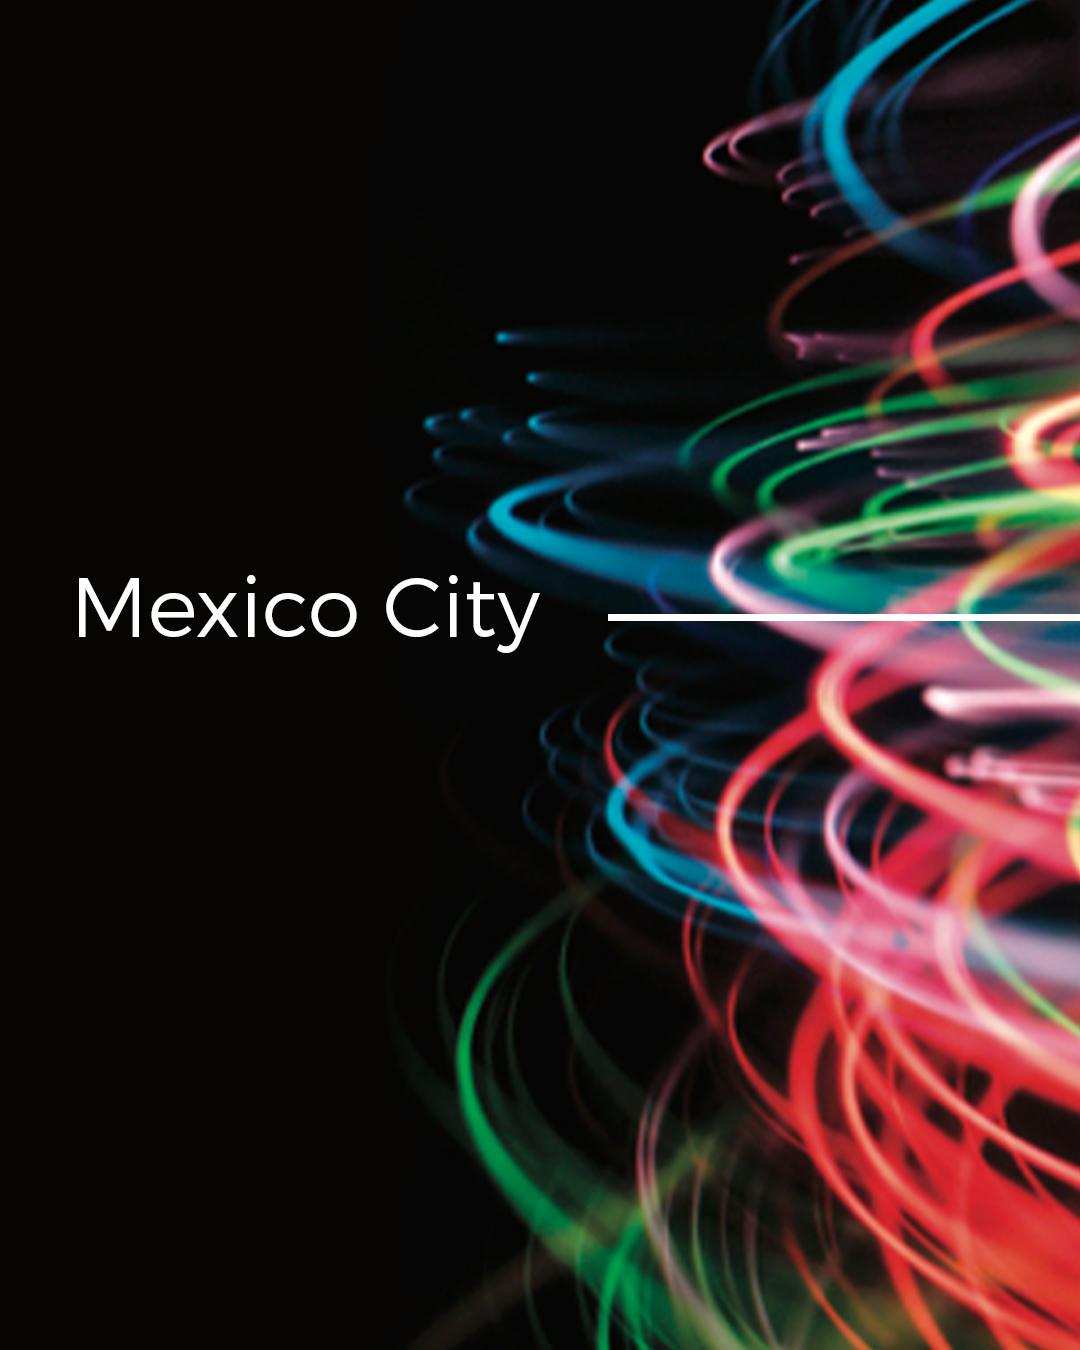 Mexico City - City Story 08.jpg